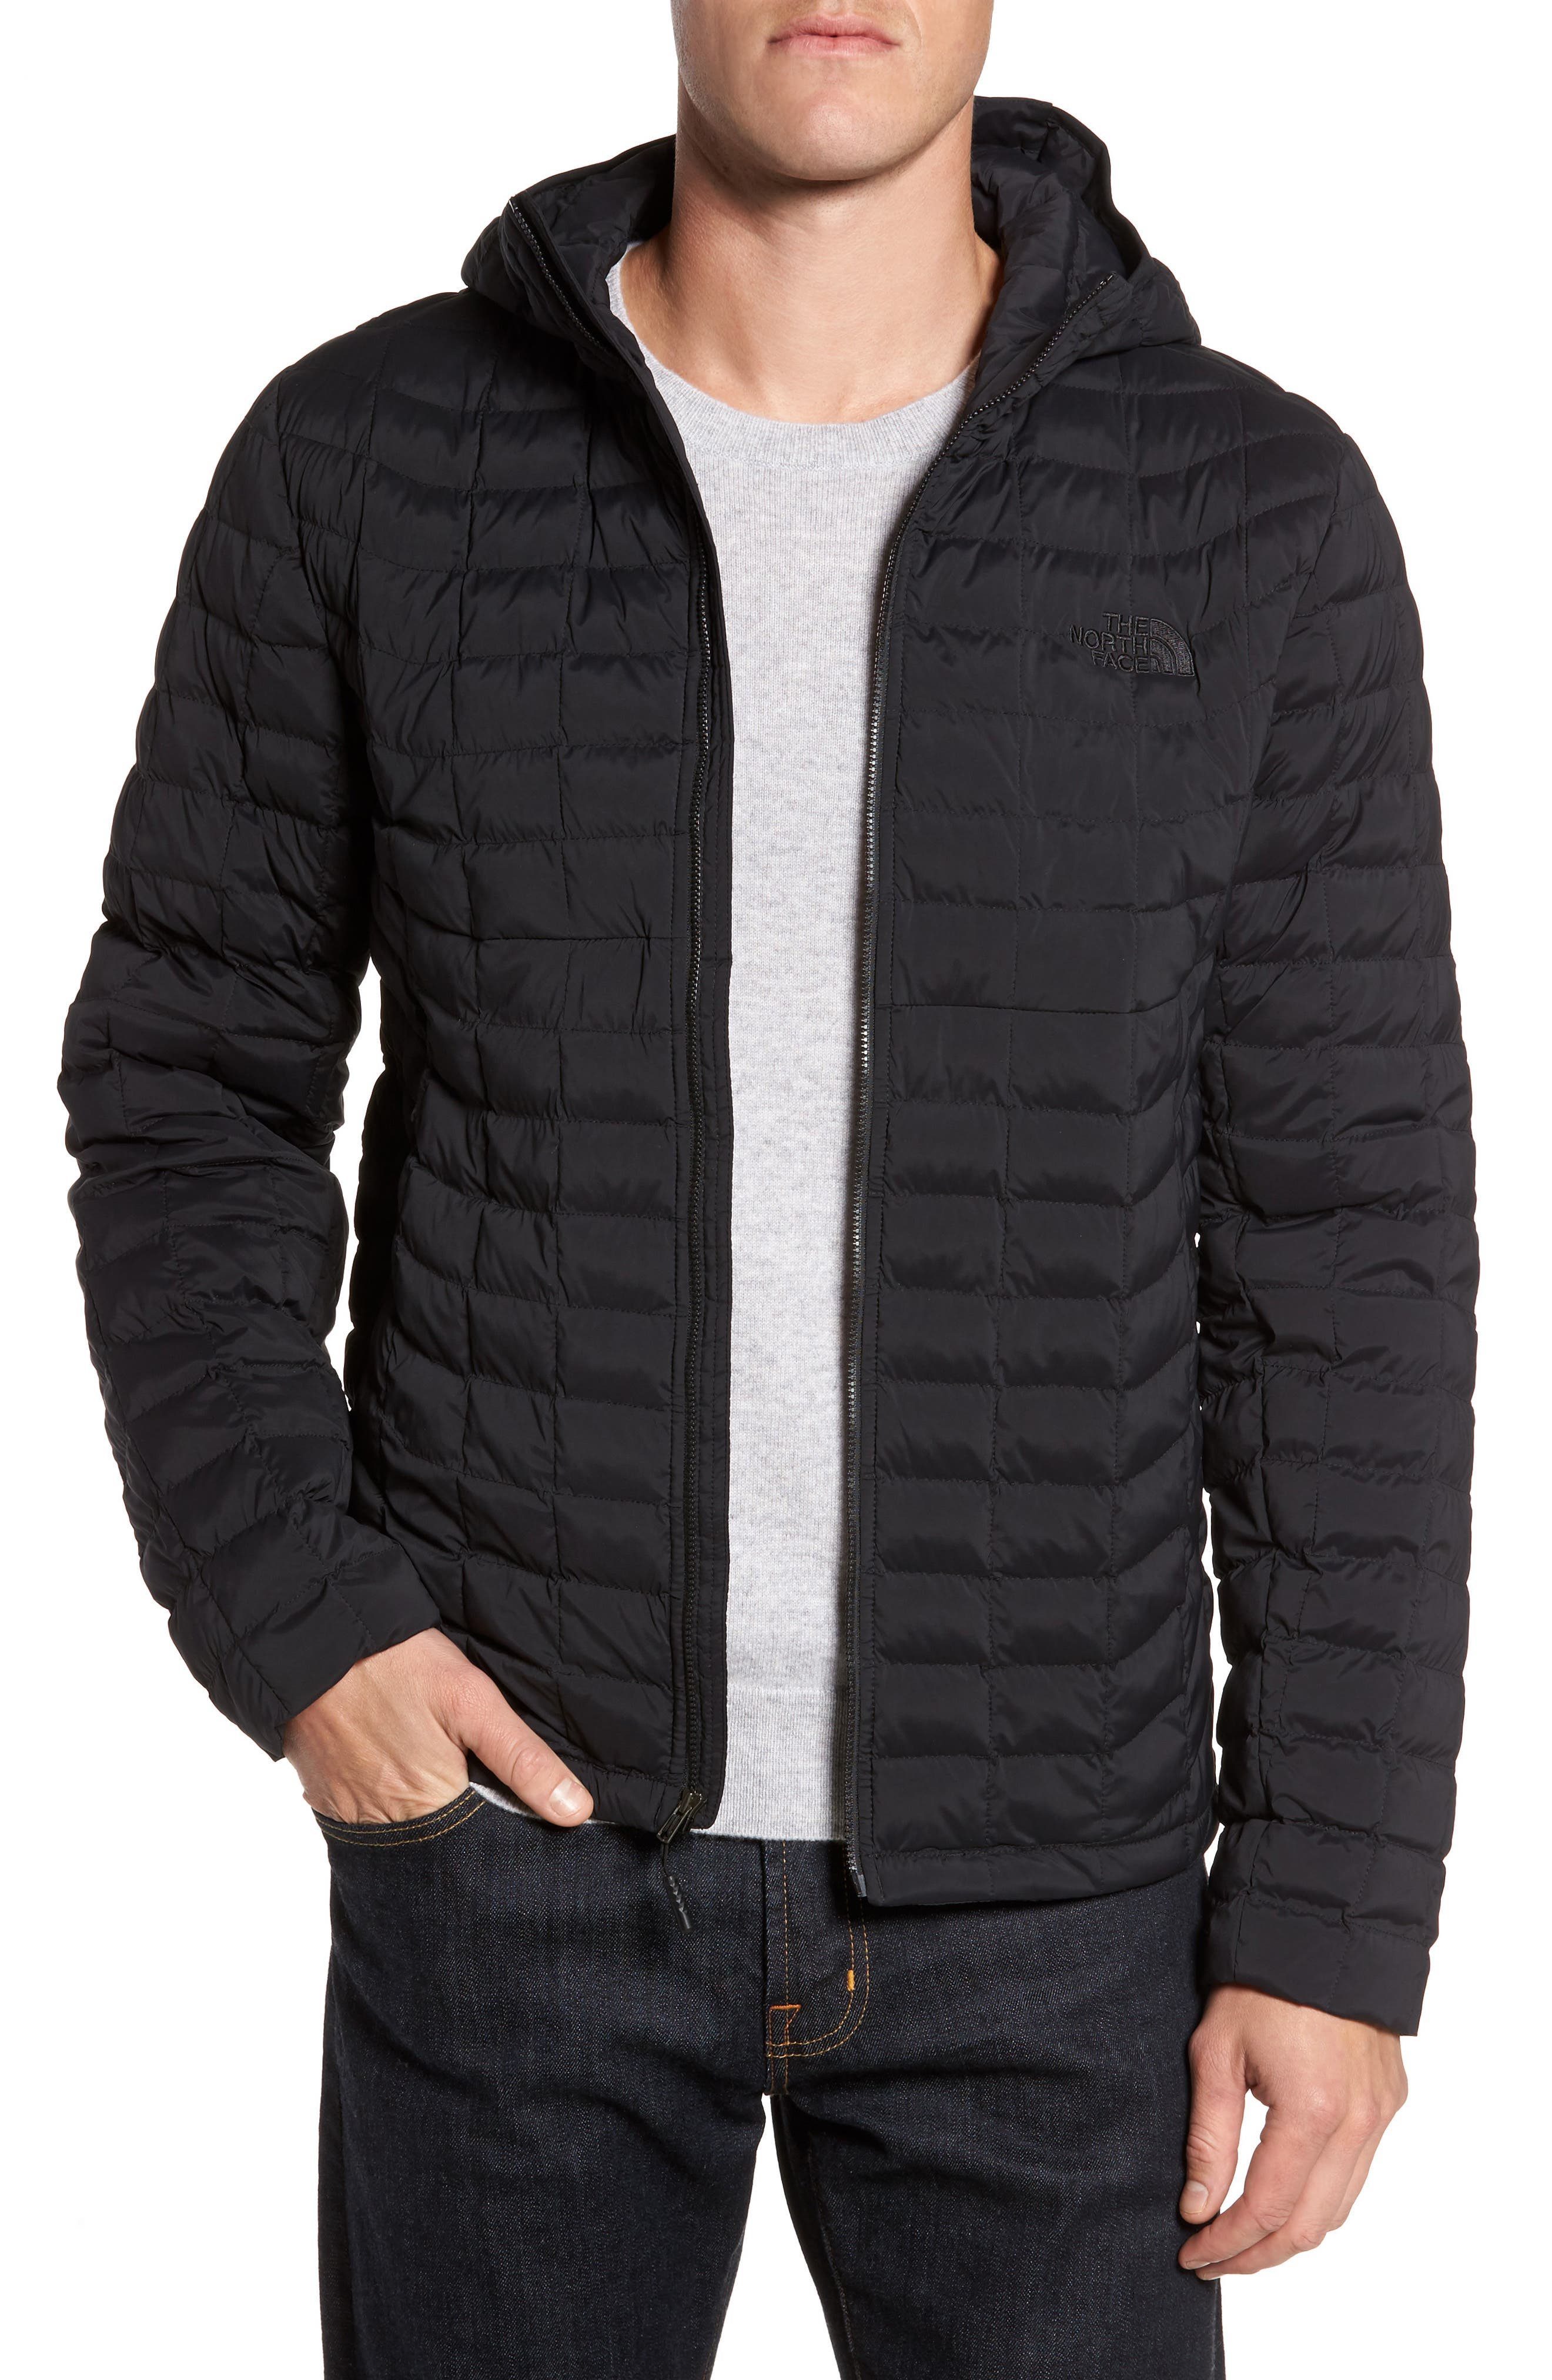 Black lightweight north face jacket